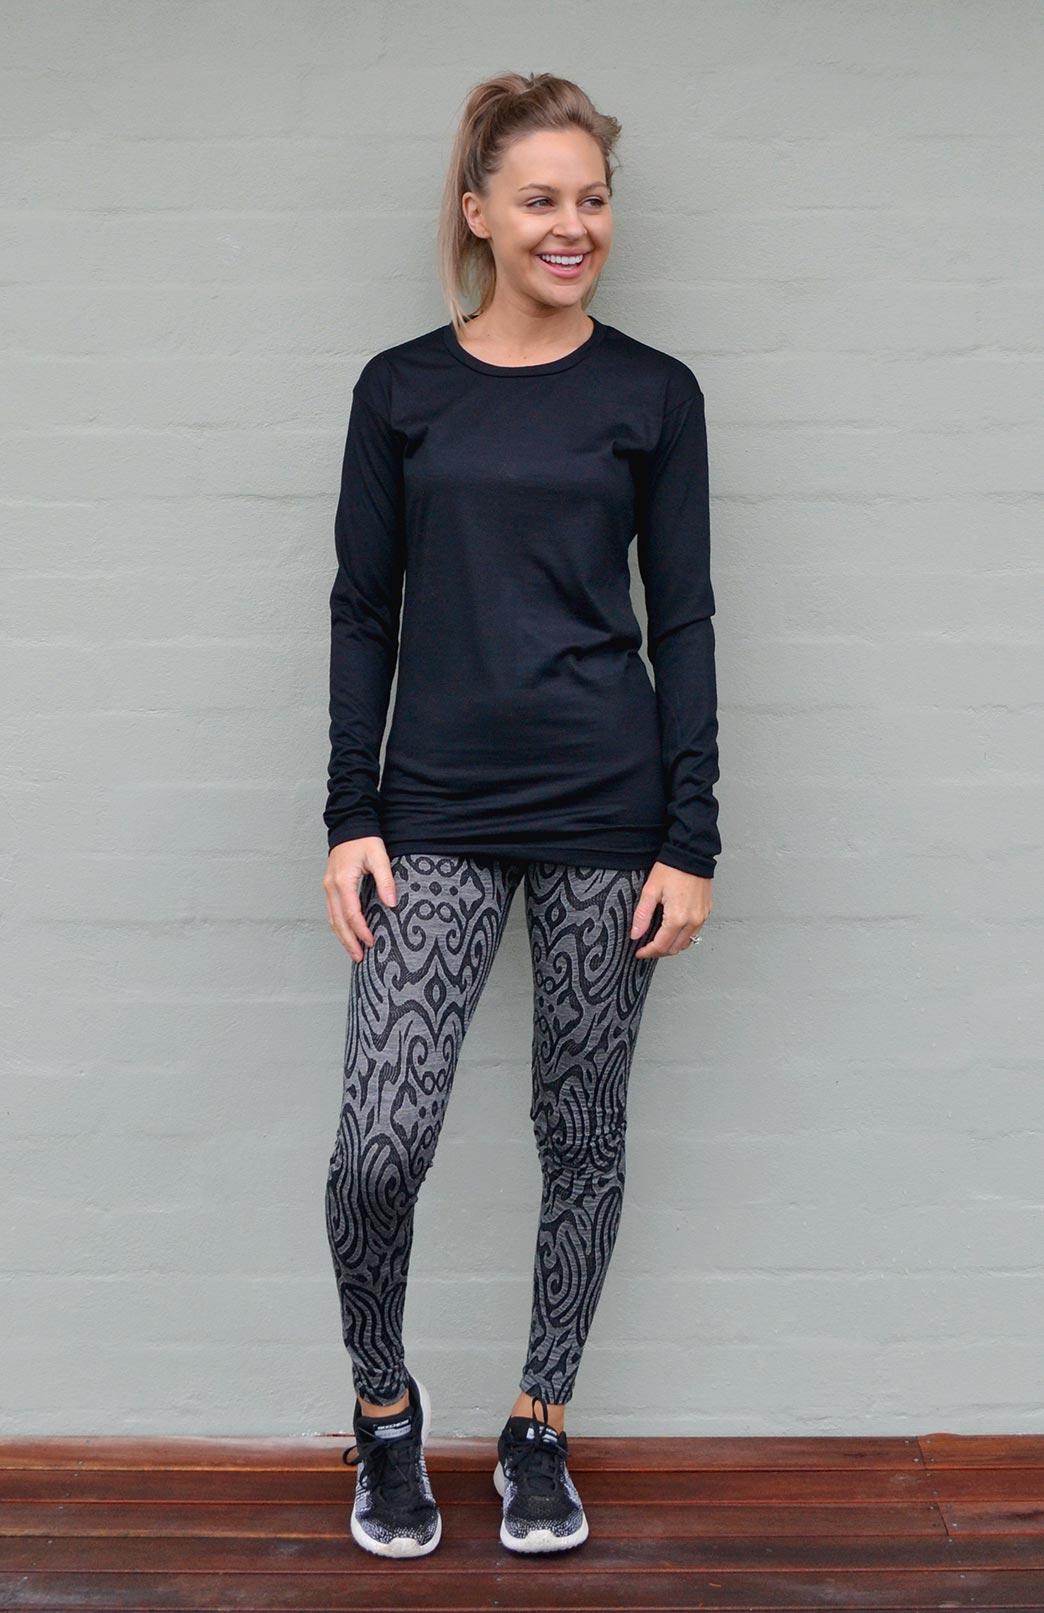 Long Sleeved Crew Neck Top - Midweight (200g) - Women's Black Wool Long Sleeved Crew Neck Pullover Top - Smitten Merino Tasmania Australia